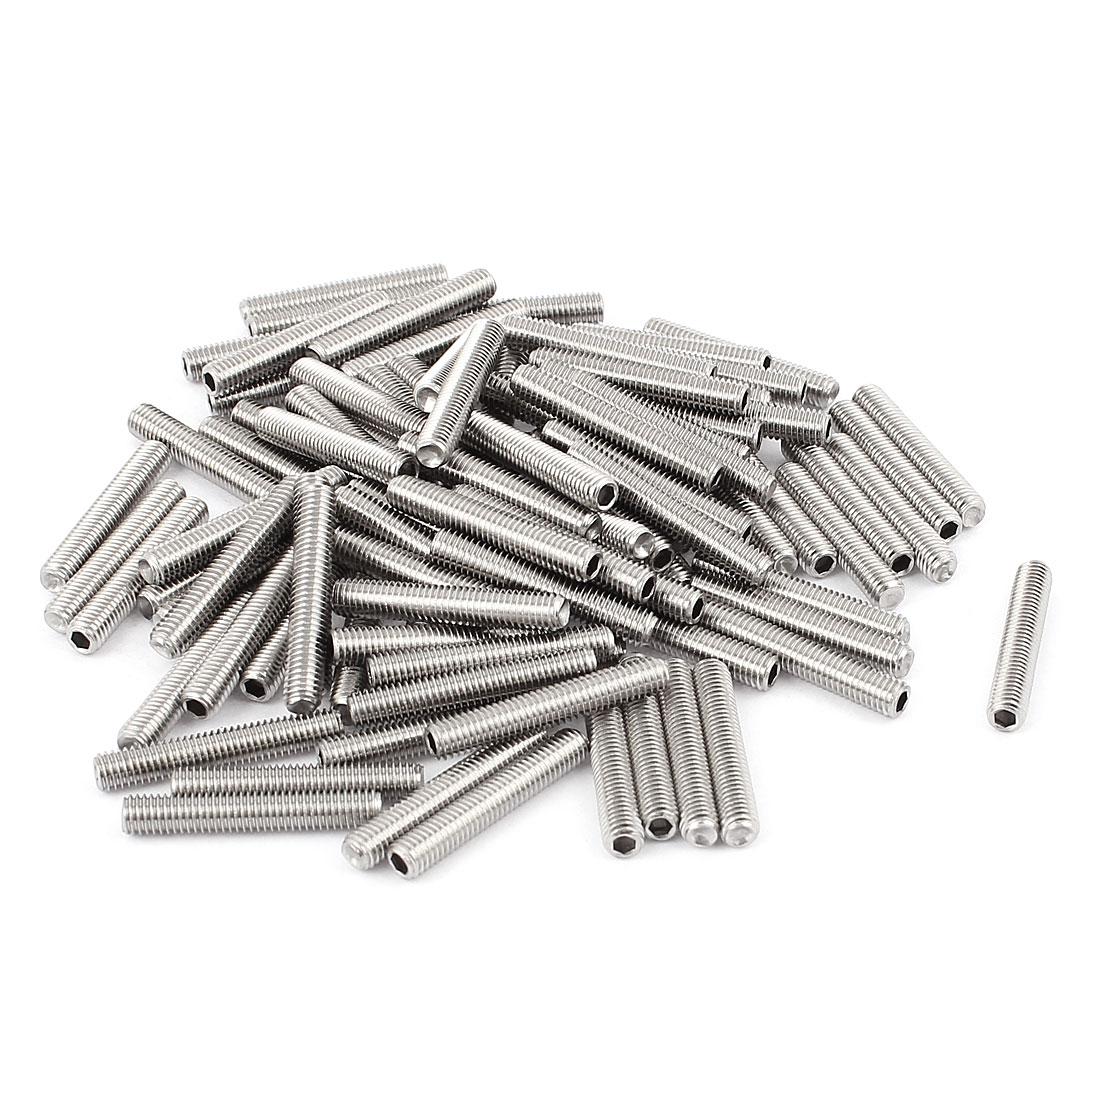 M5x30mm Stainless Steel Hex Socket Set Cap Point Grub Screws Silver Tone 100Pcs